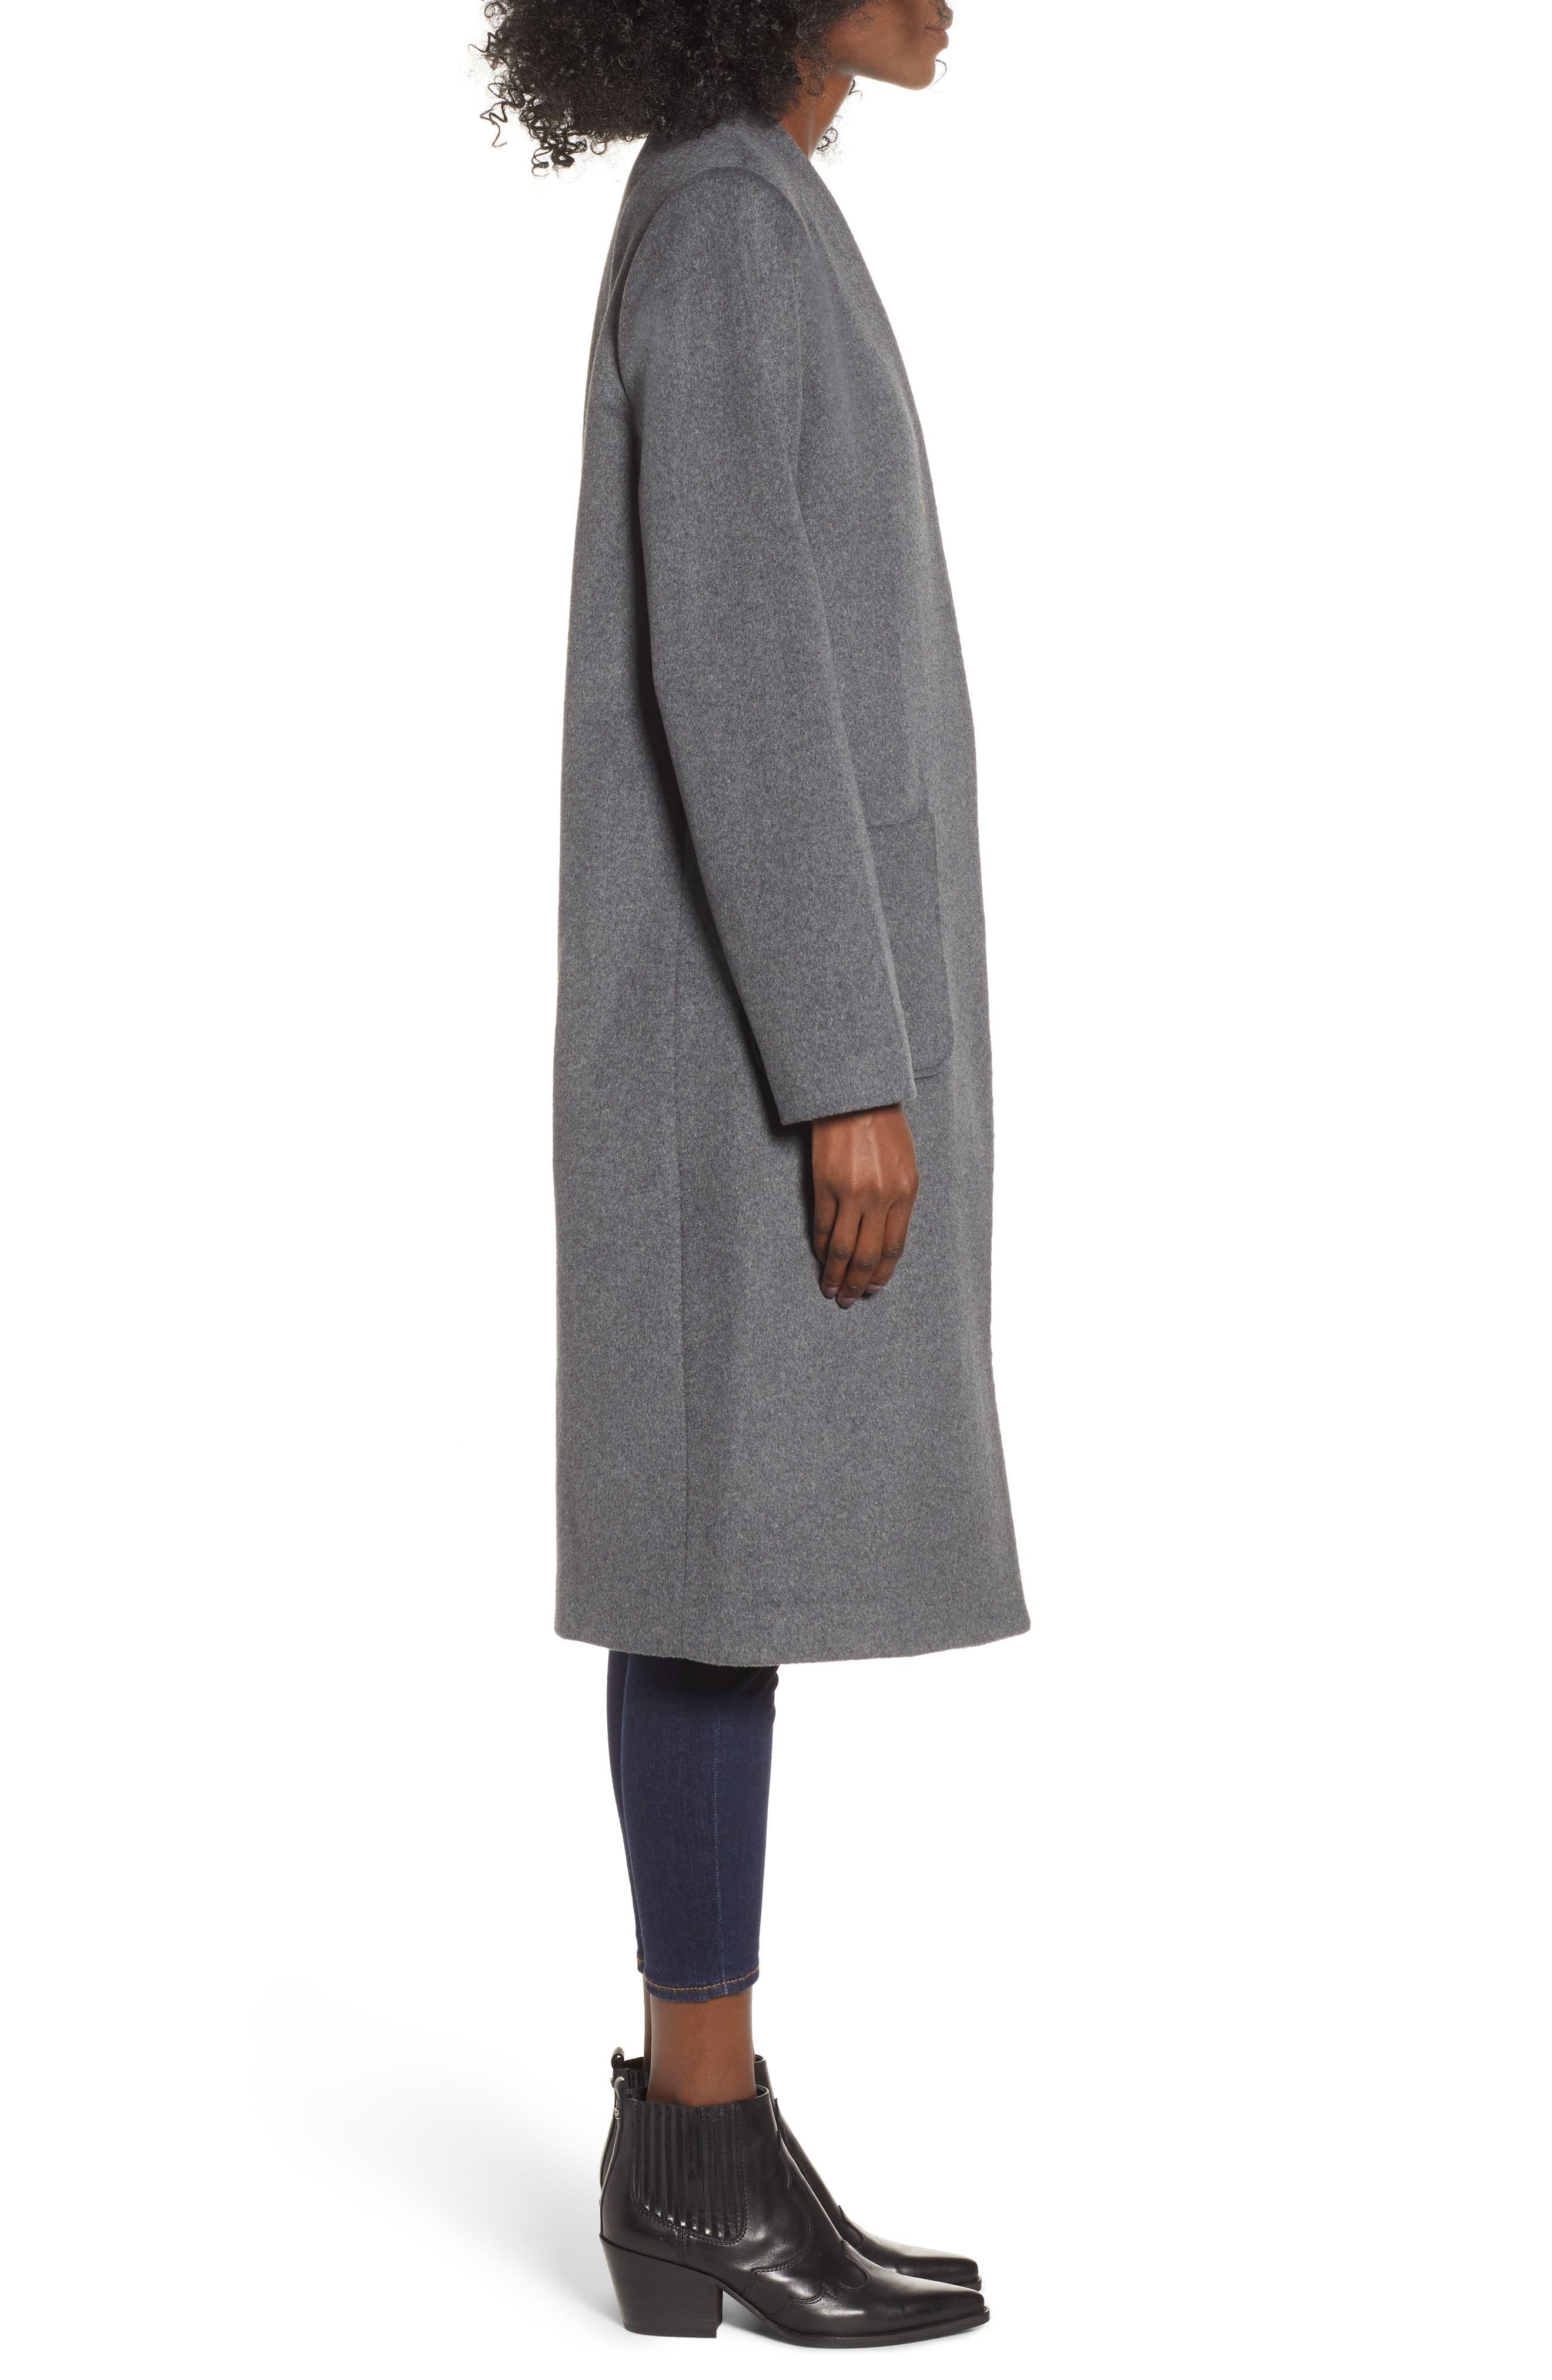 MURAL,                             Long Open Front Coat,                             Alternate thumbnail 3, color,                             CHARCOAL GREY